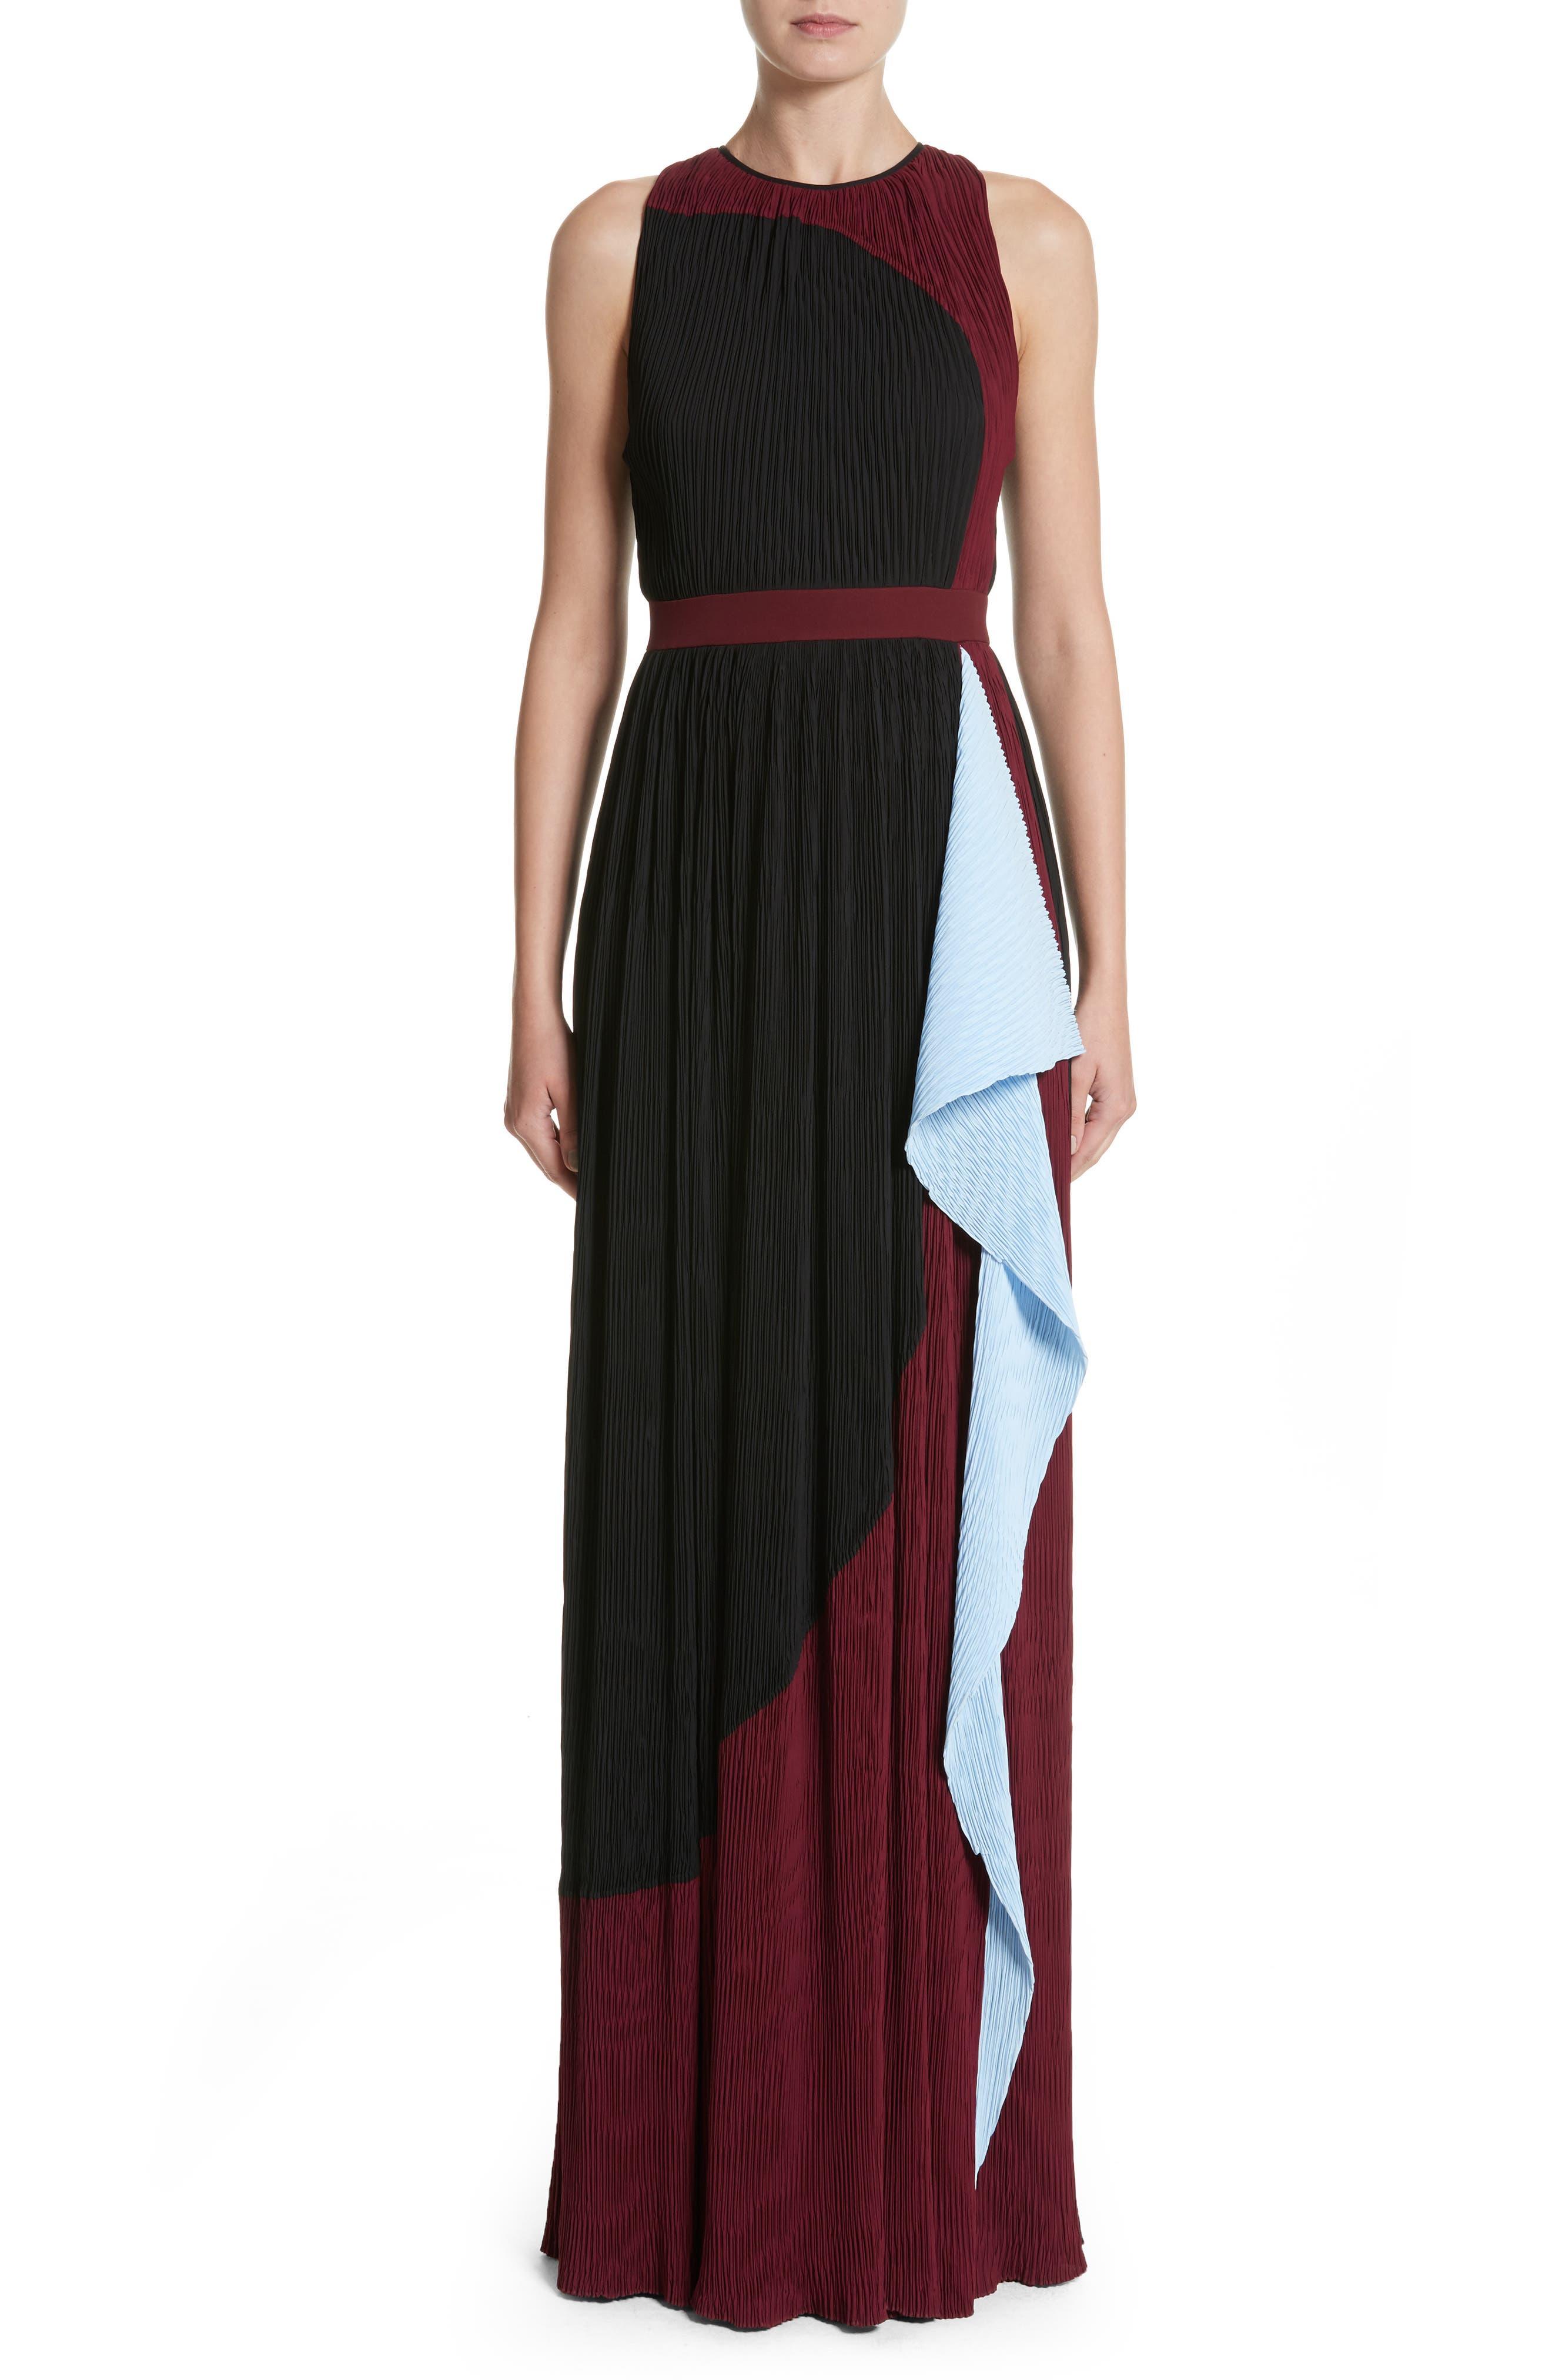 Milda Crystal Pleat Dress,                         Main,                         color, 010